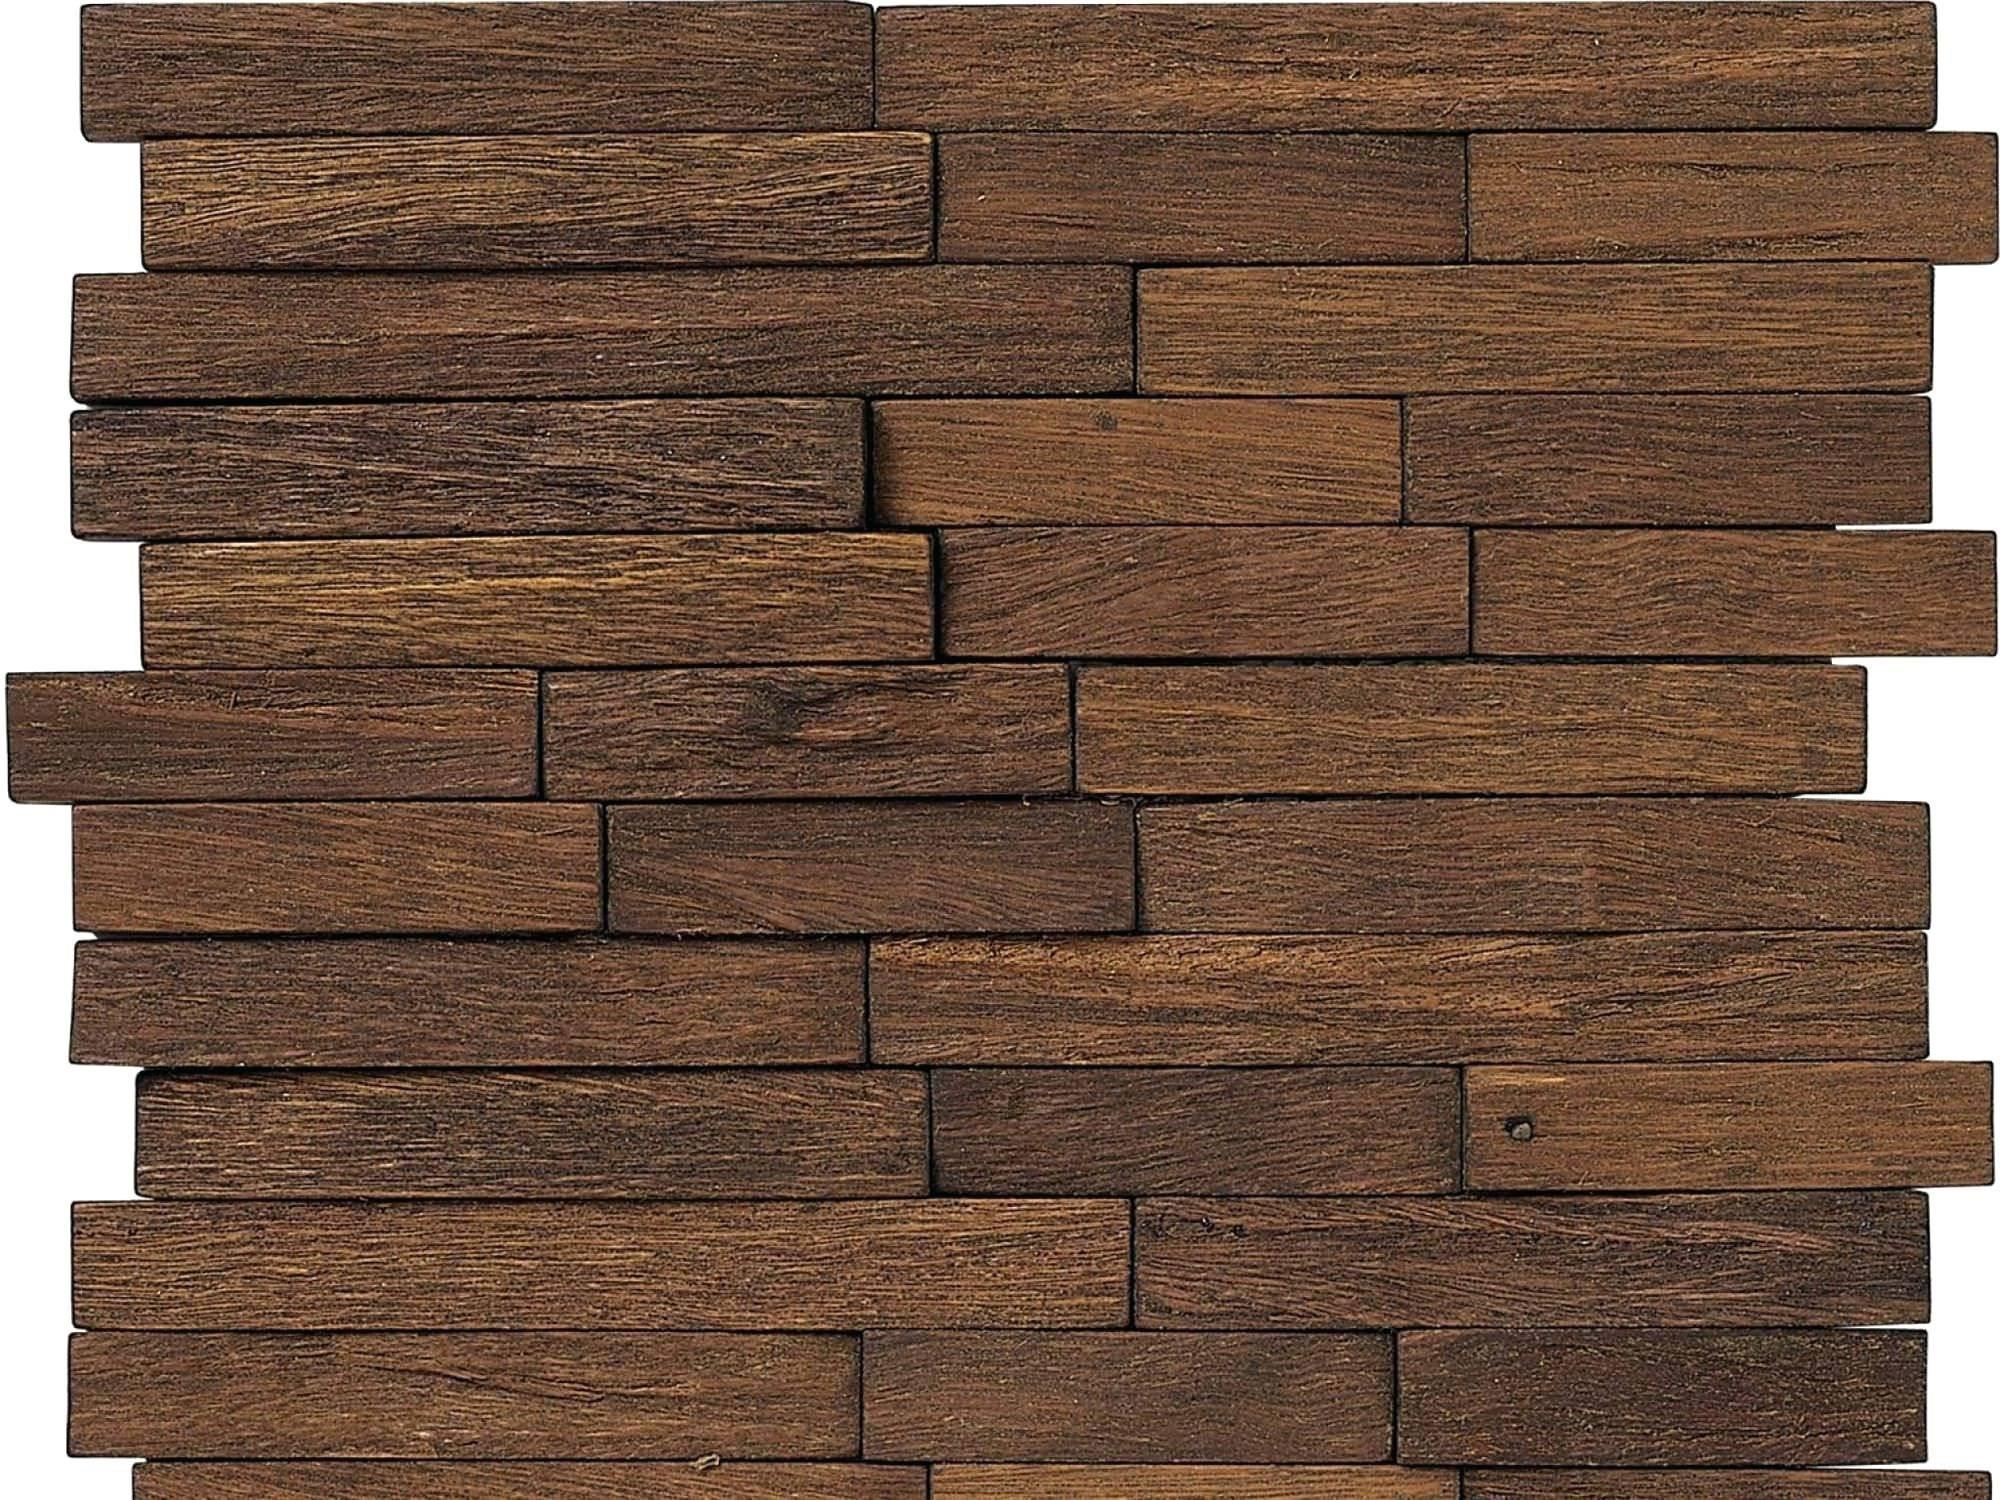 cheap hardwood floor vacuum of the wood maker page 2 wood wallpaper regarding floor patterns new metal wall art panels fresh 1 kirkland wall decor home design 0d ideas of wood